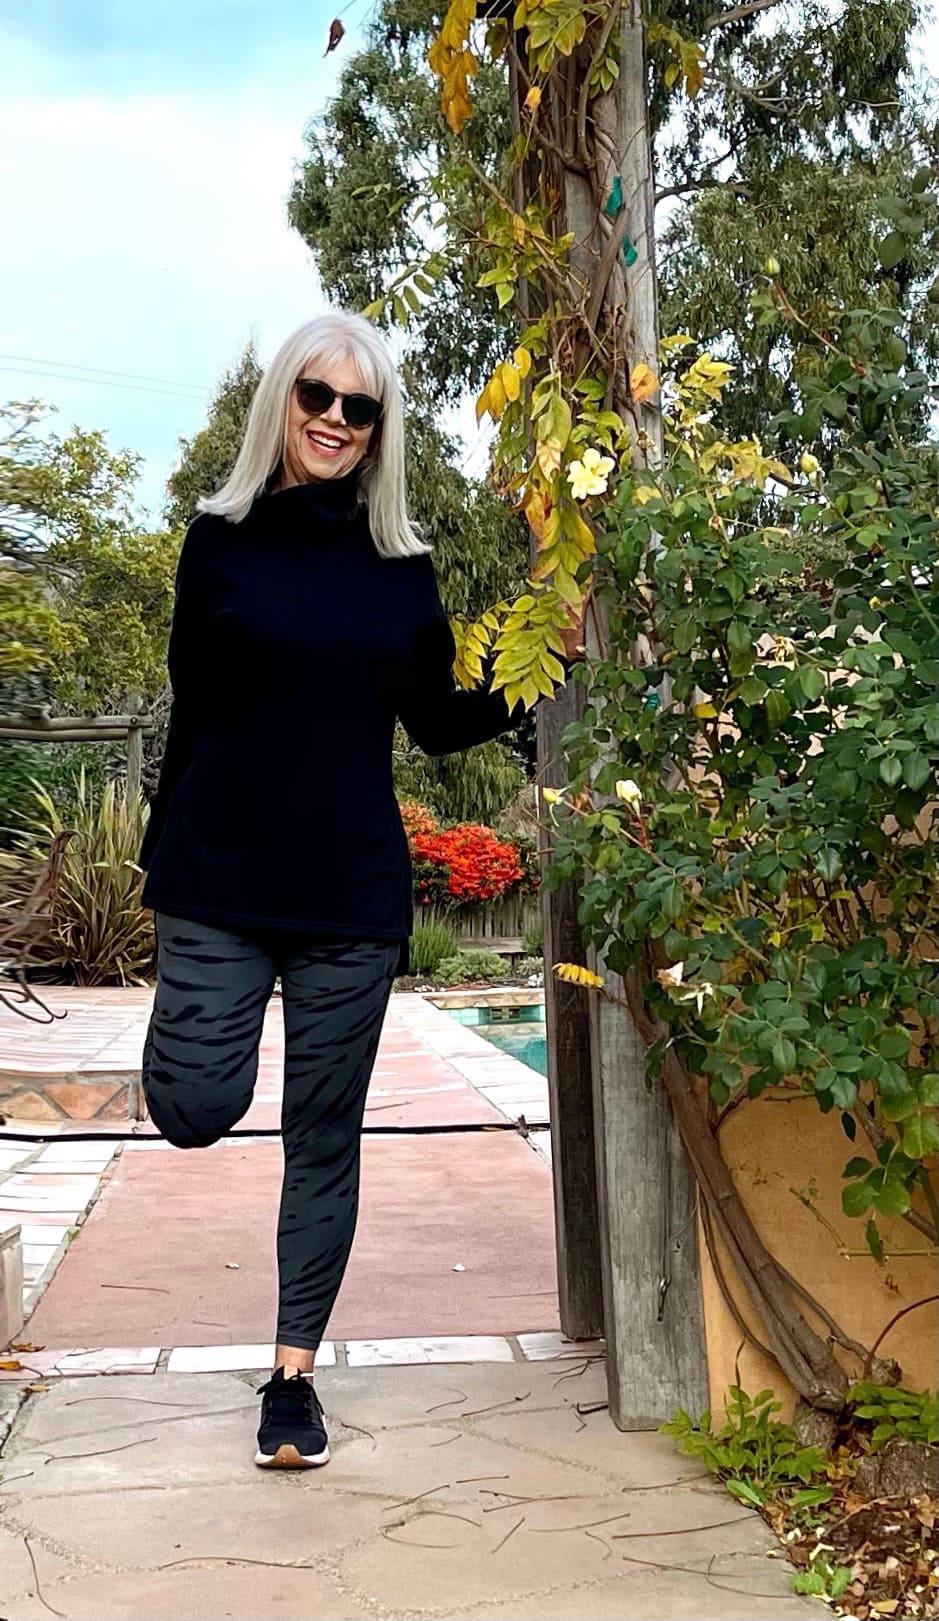 cindy hattersley in Target Sweatshirt and Athleta leggings and new balance tennies